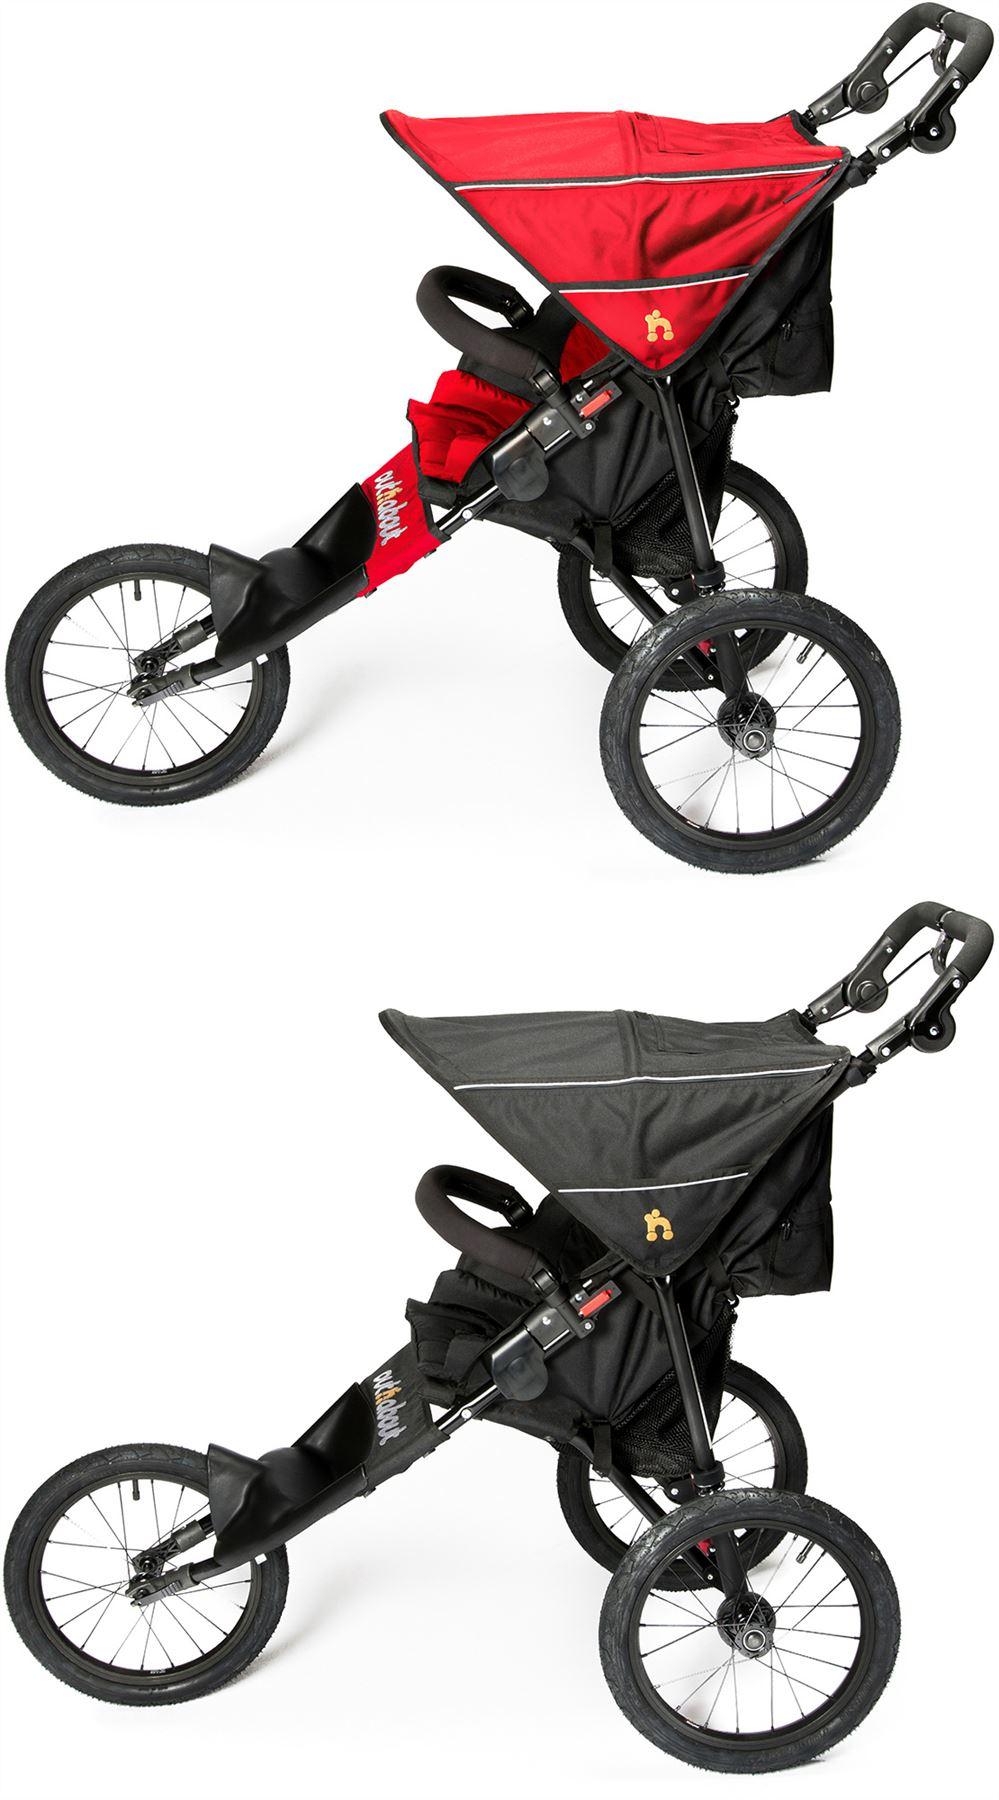 out 39 n 39 about nipper sportkarre baby kleinkind kindersportkinderwagen kinderwagen ebay. Black Bedroom Furniture Sets. Home Design Ideas